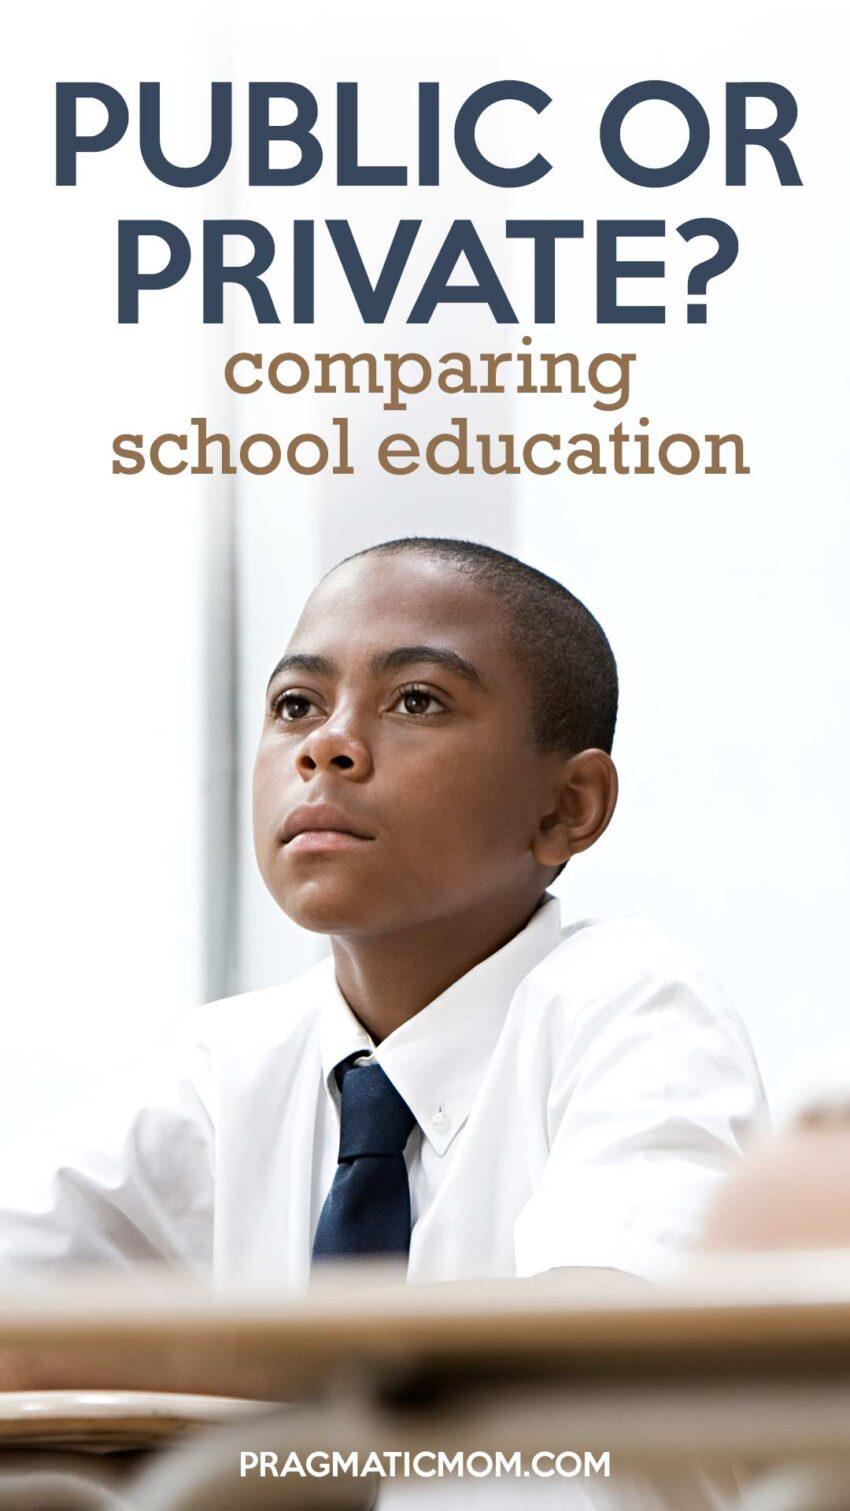 Comparing Private School with Public School Education